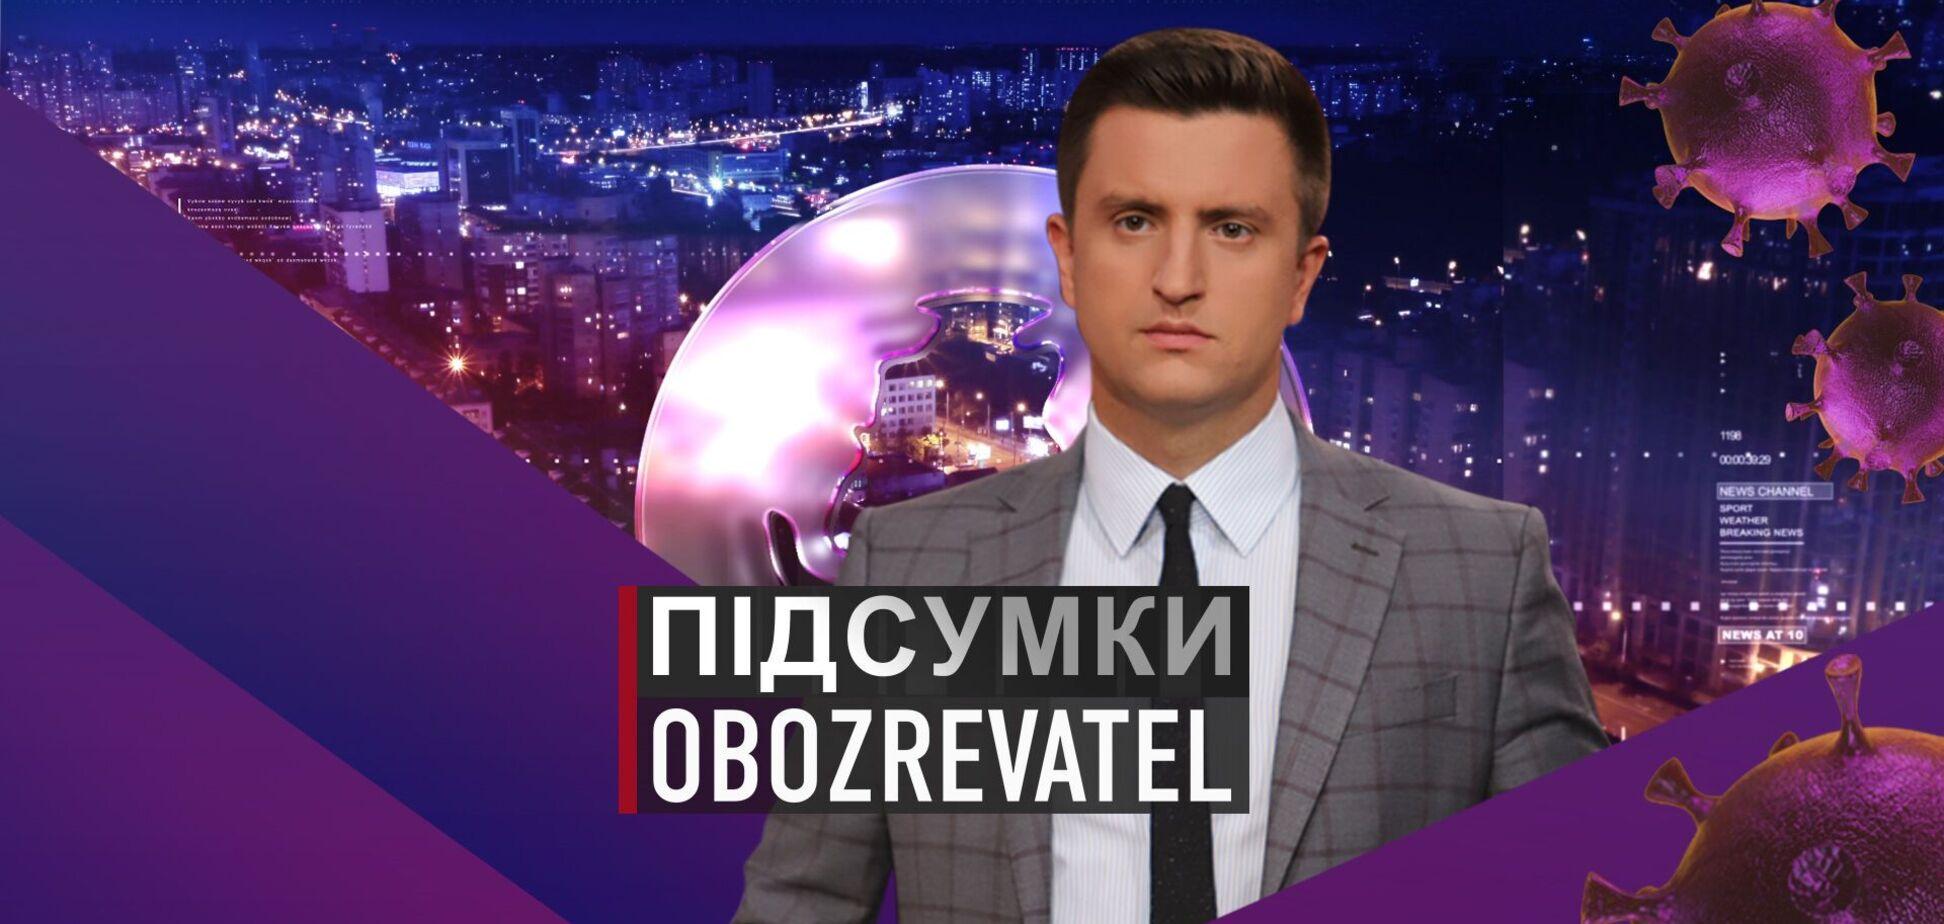 Підсумки с Вадимом Колодийчуком. Понедельник, 15 марта